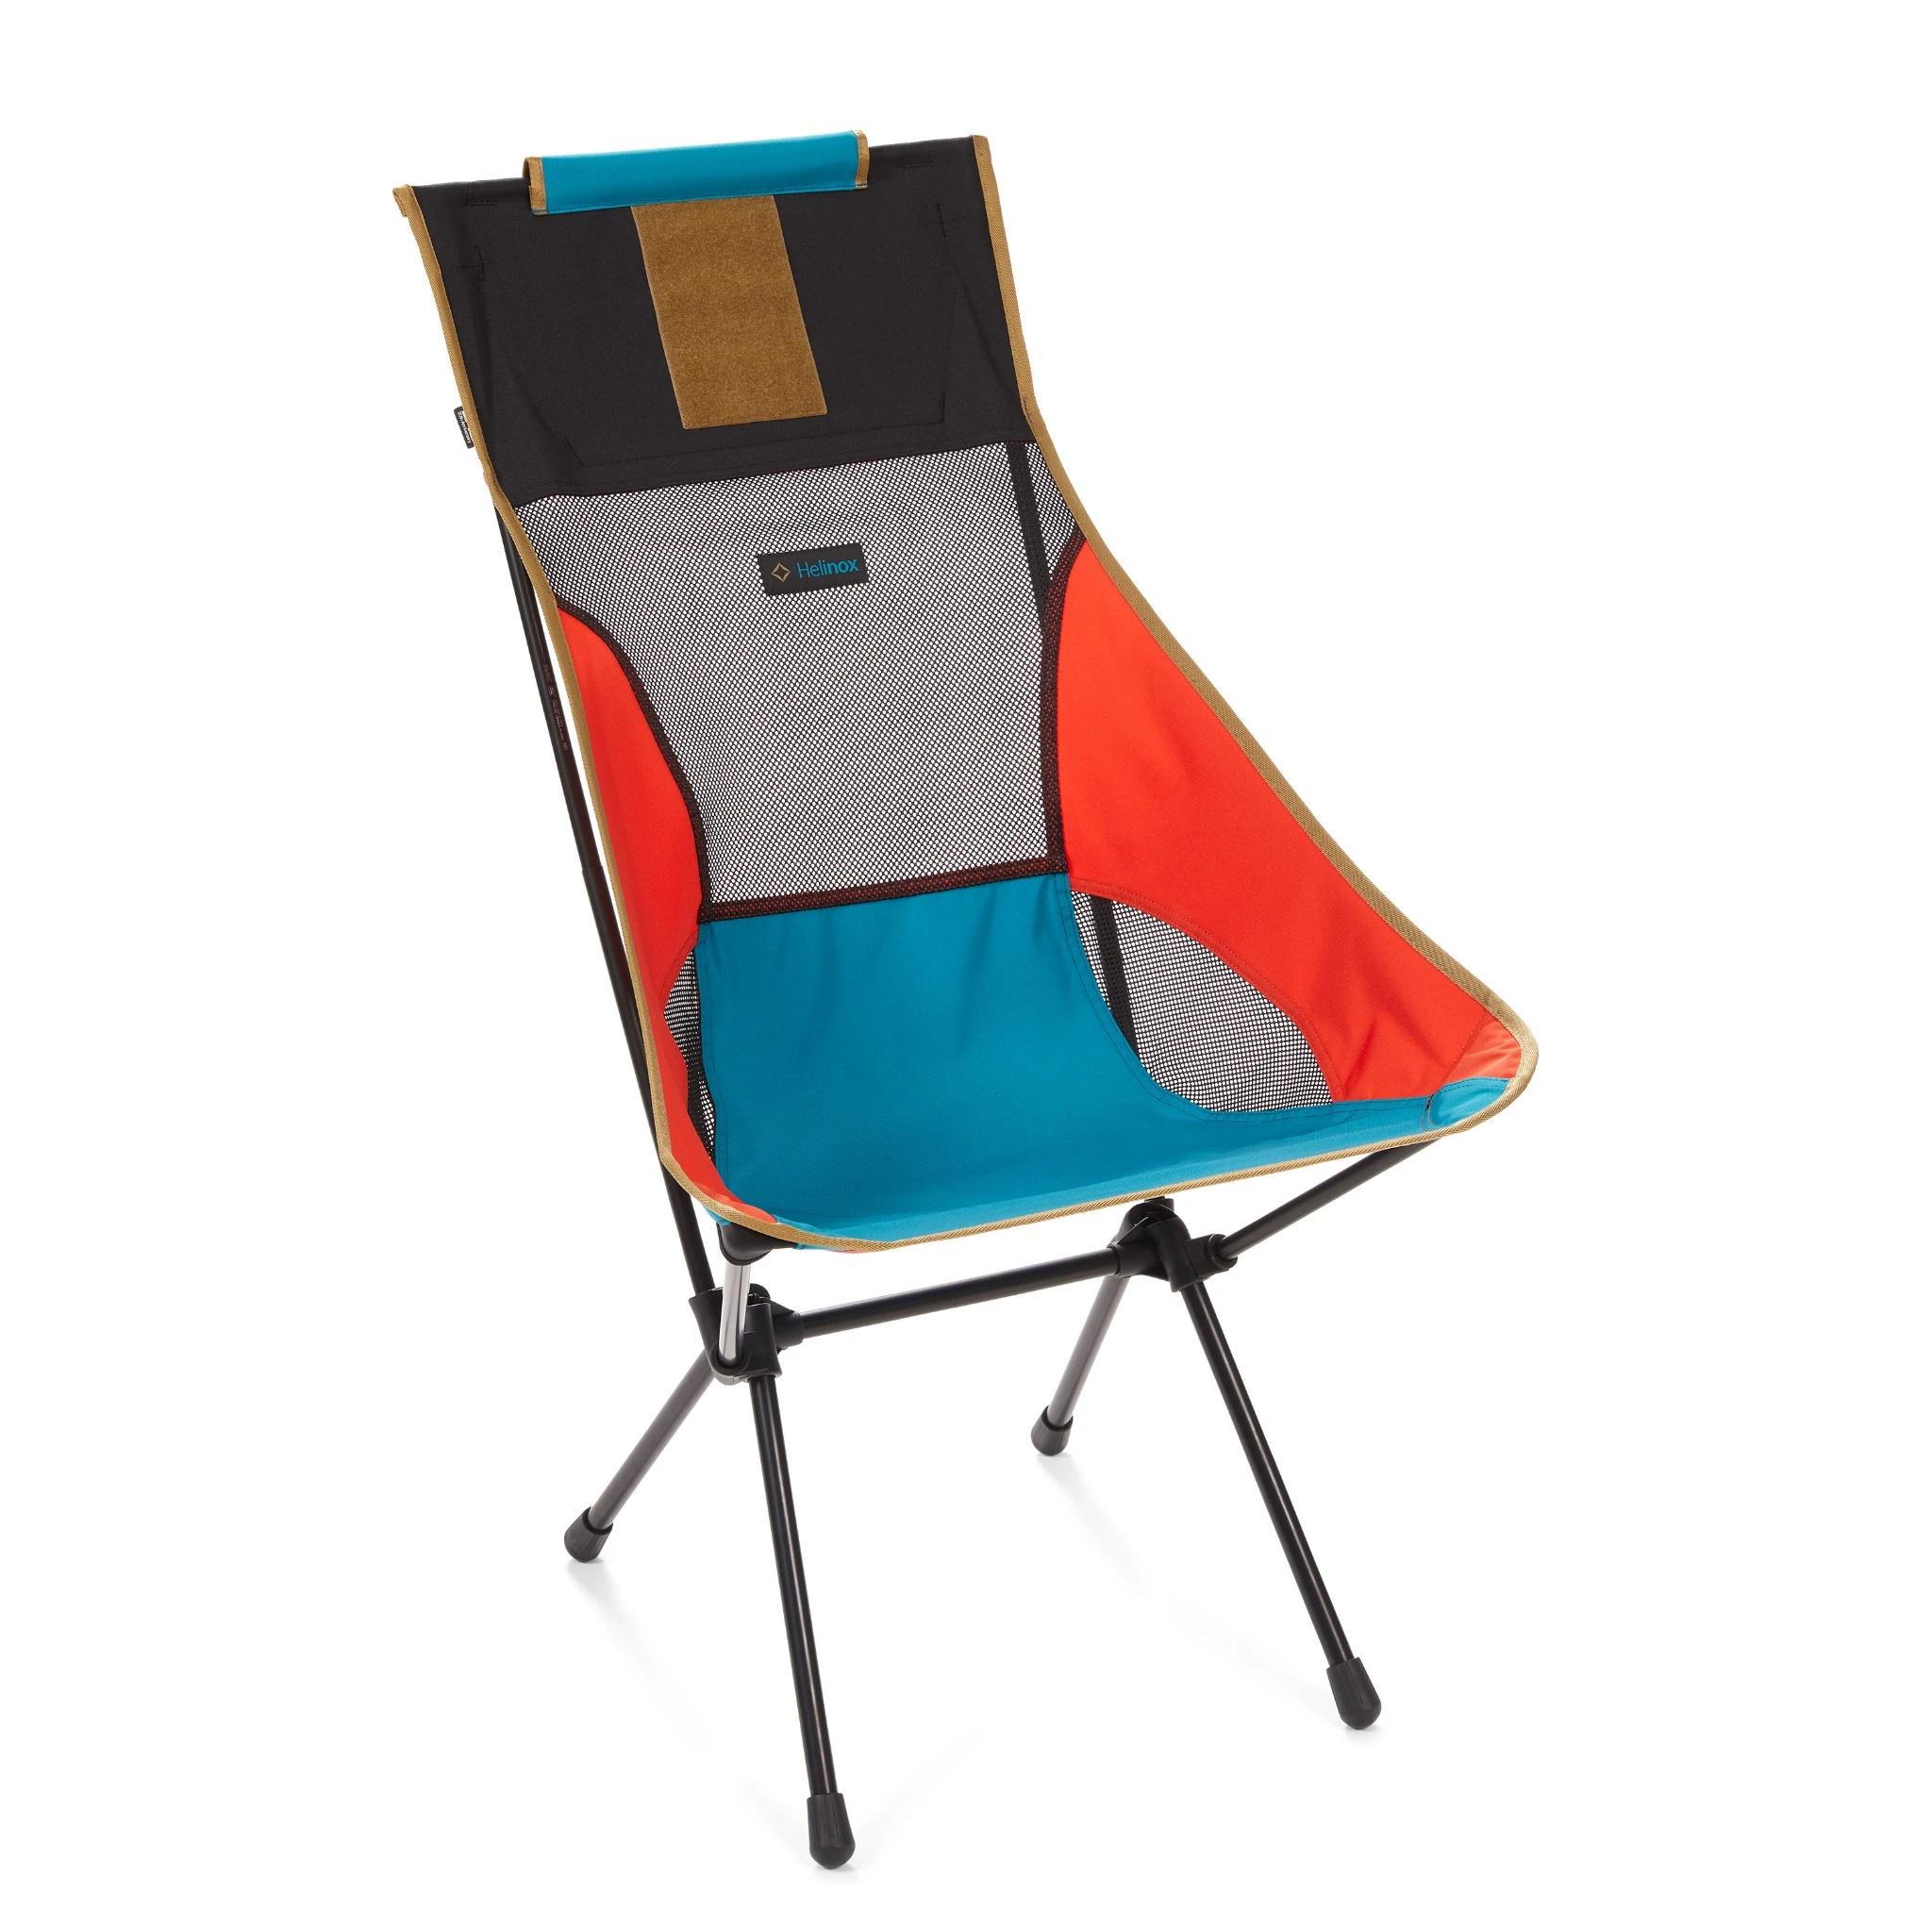 Sunset Chair - Multi Block